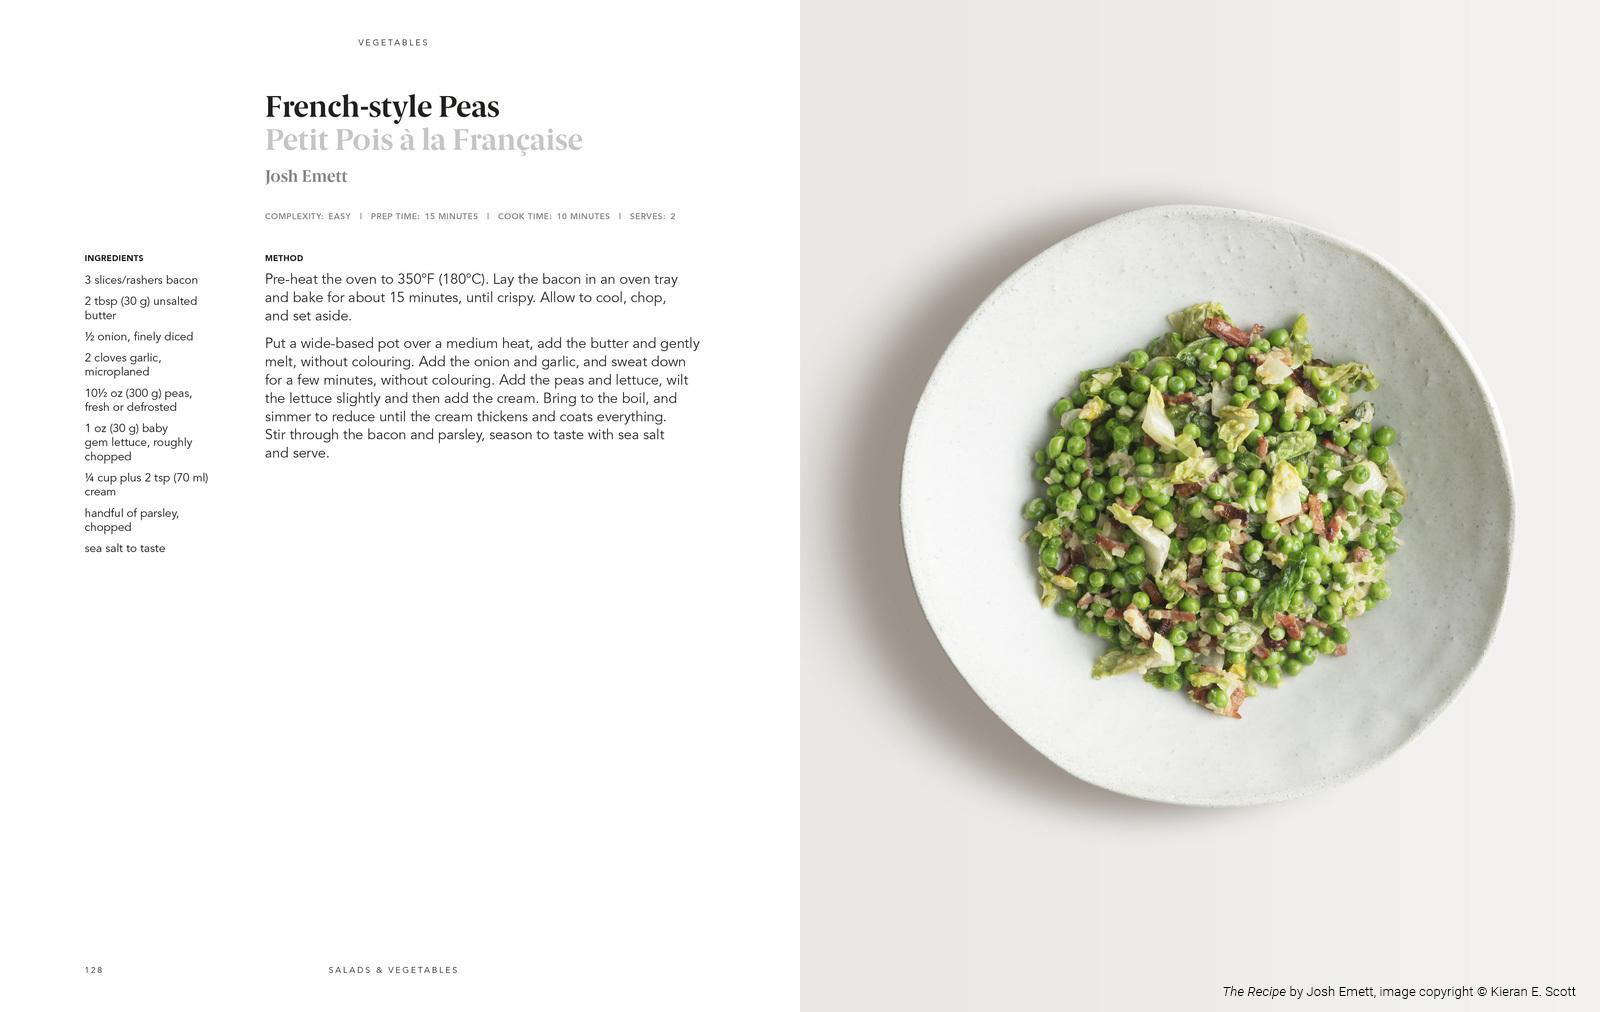 The Recipe by Josh Emett image